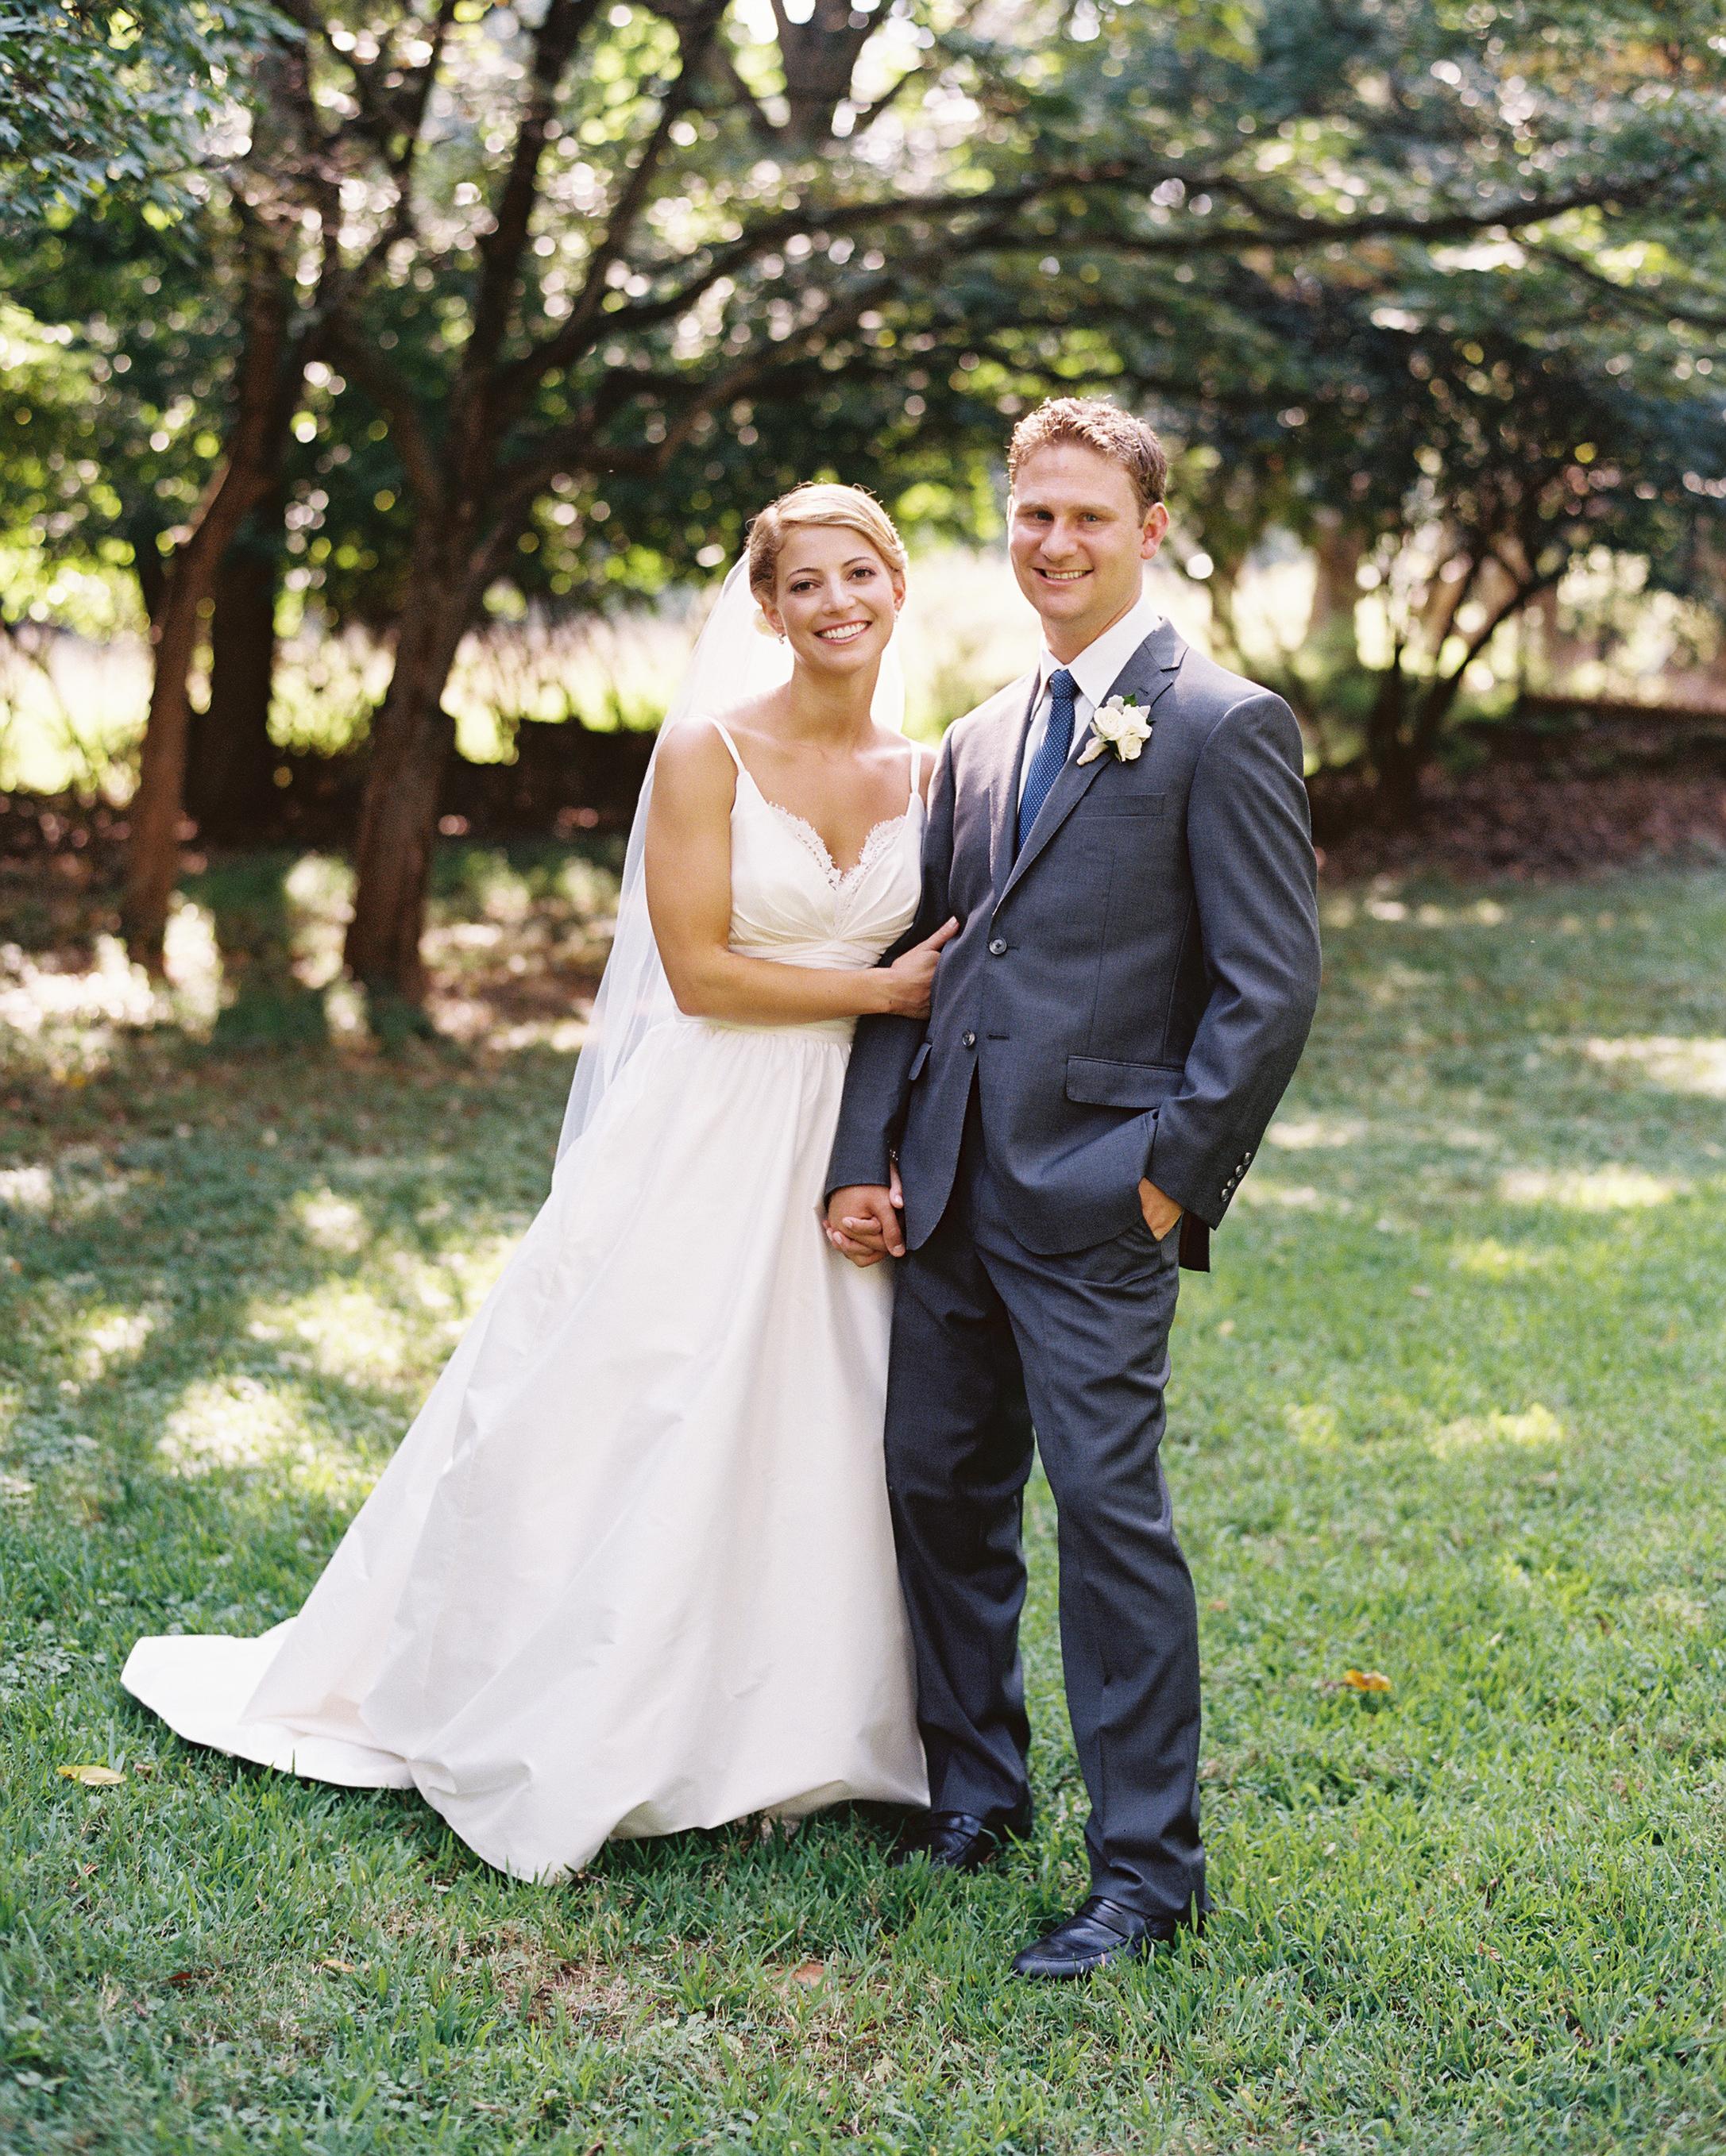 beth-scott-wedding-couple-0430-s112077-0715.jpg